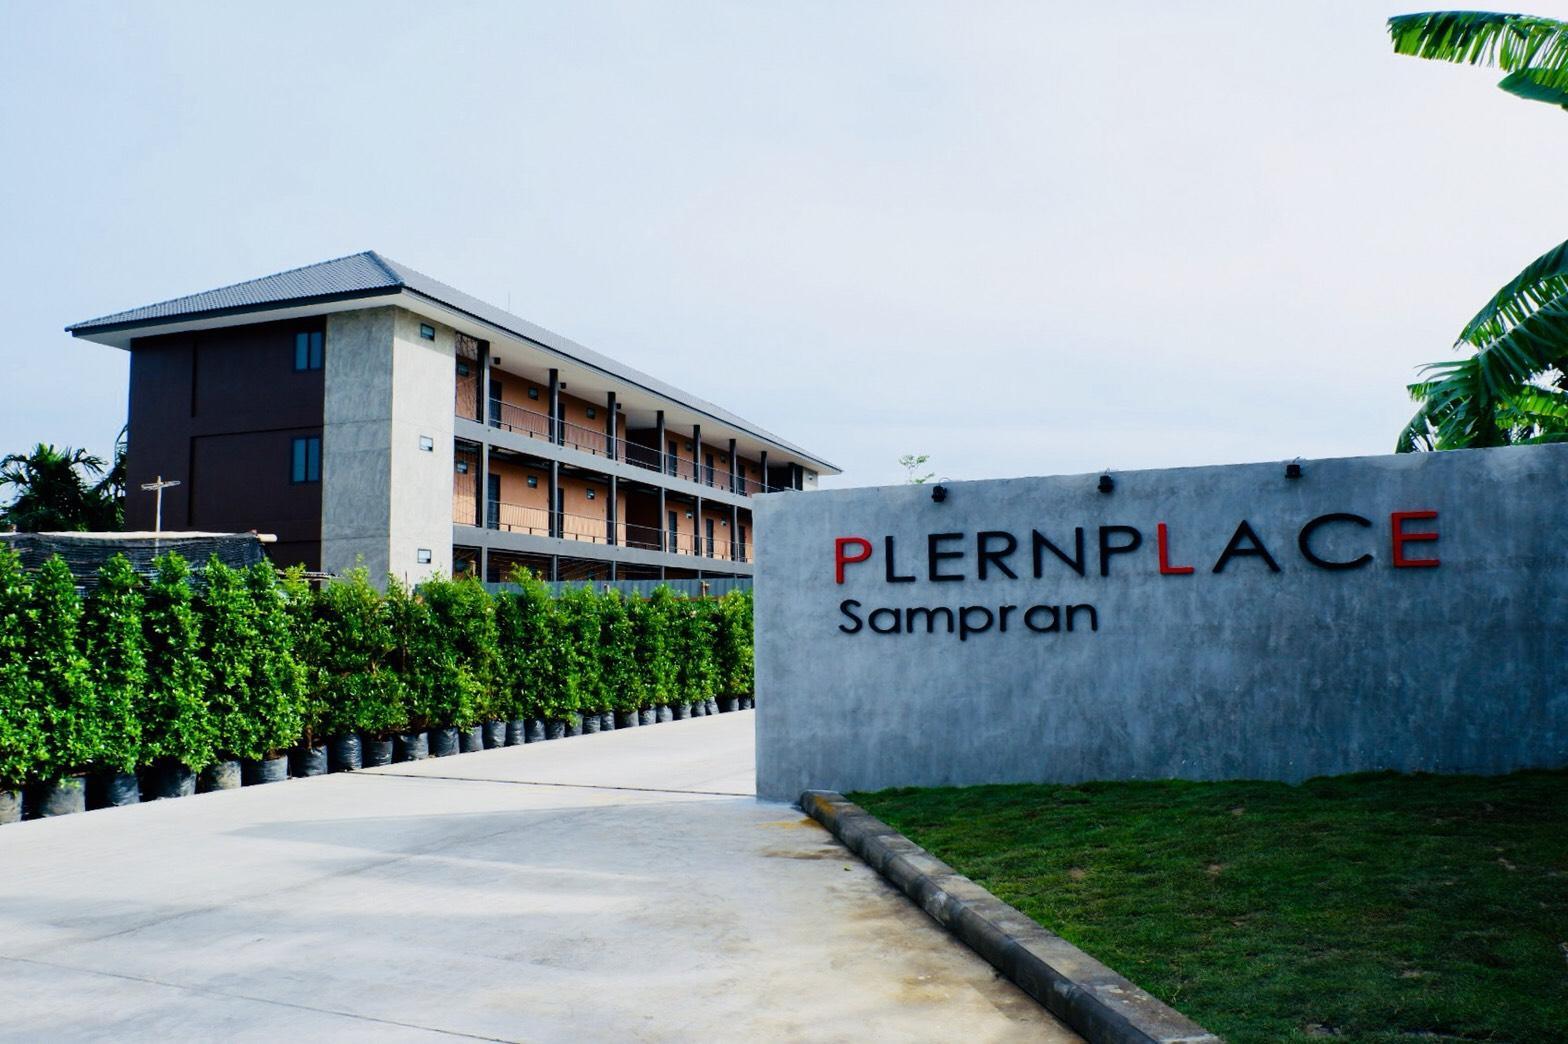 Plernplace